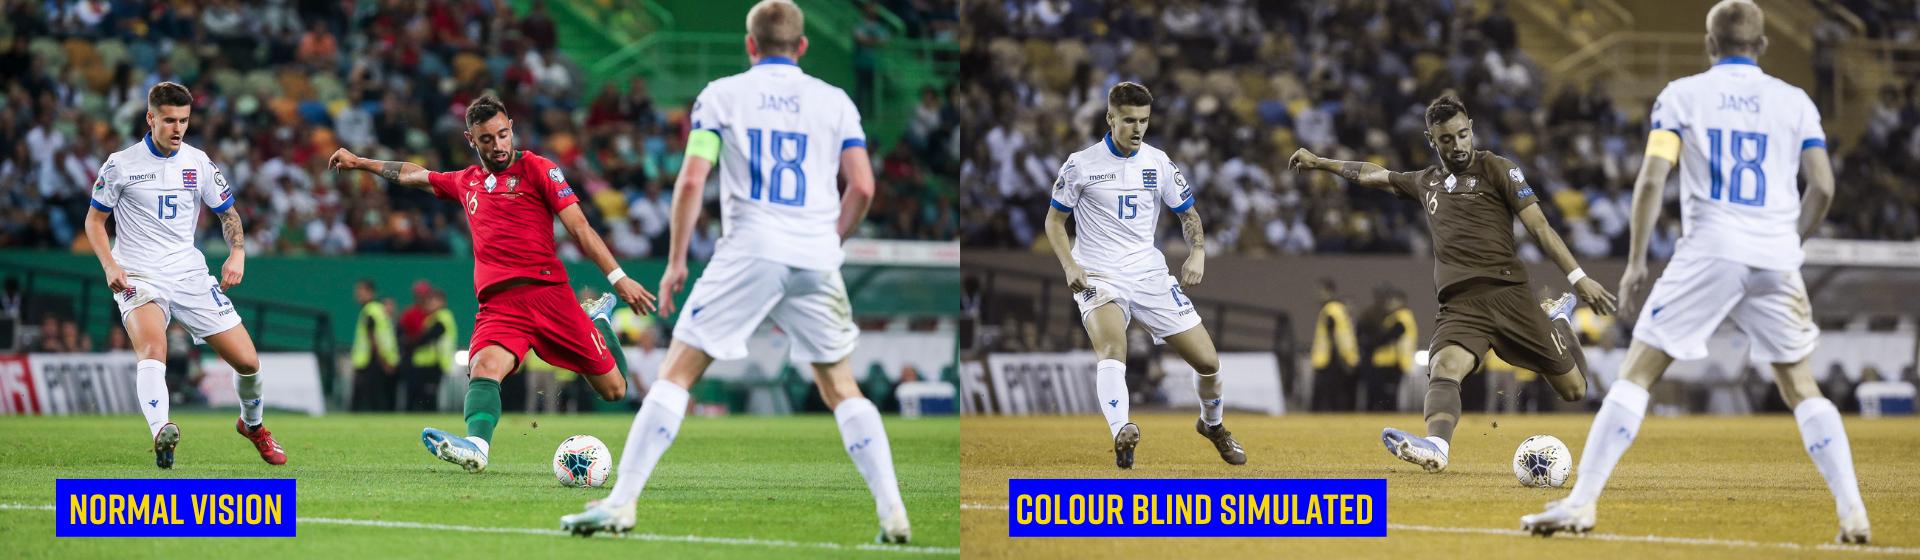 Colour Blind Awareness Day header